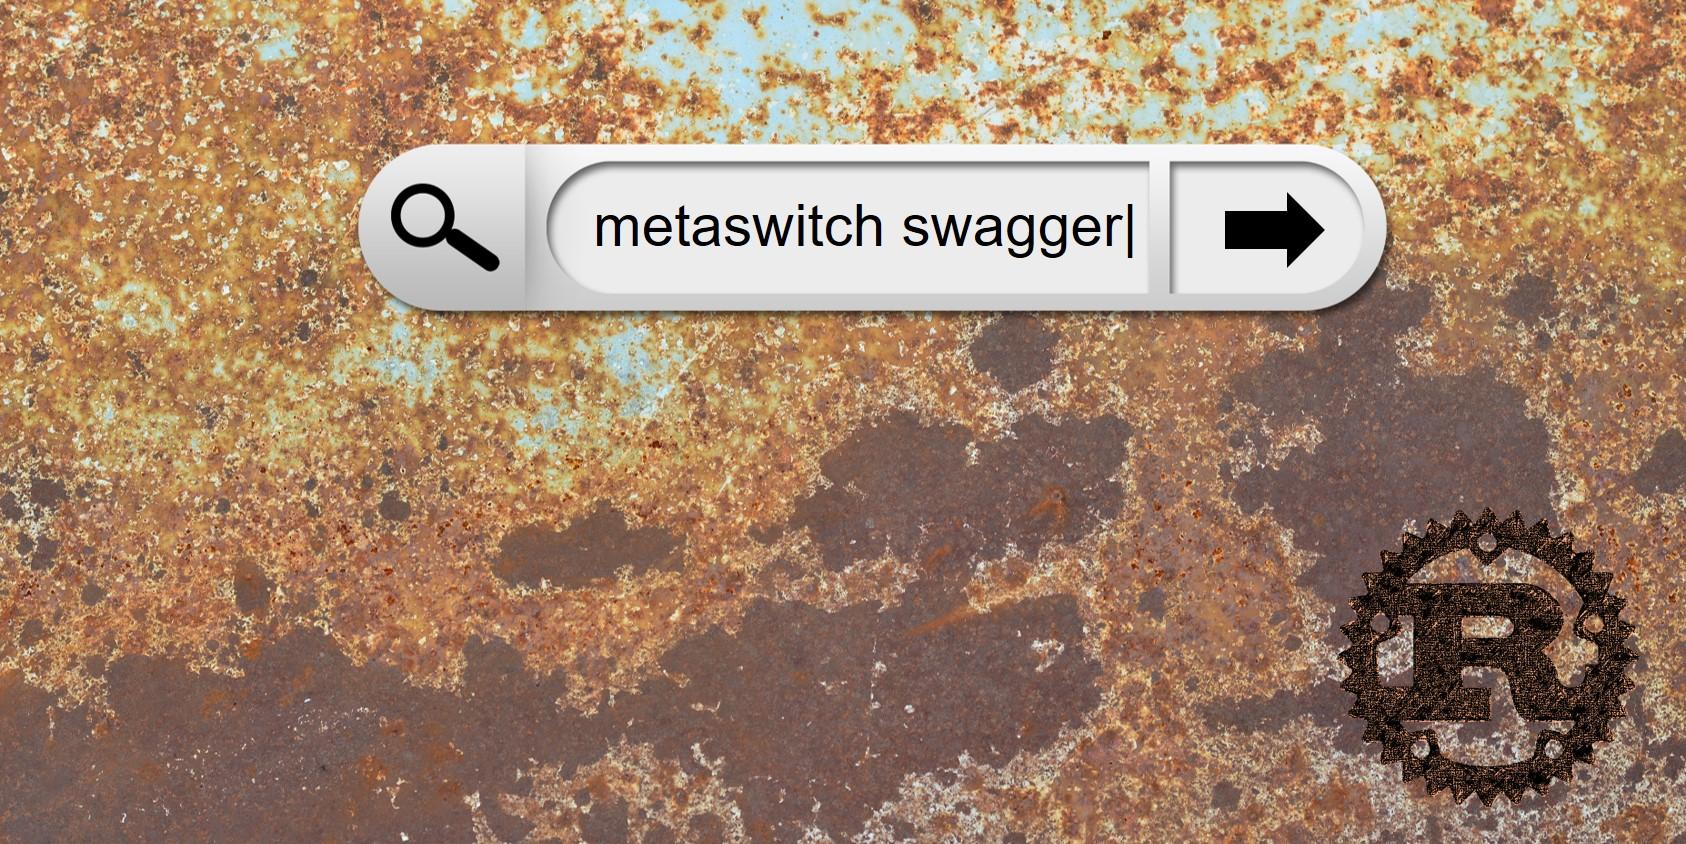 metaswitch-rust-swagger.jpg